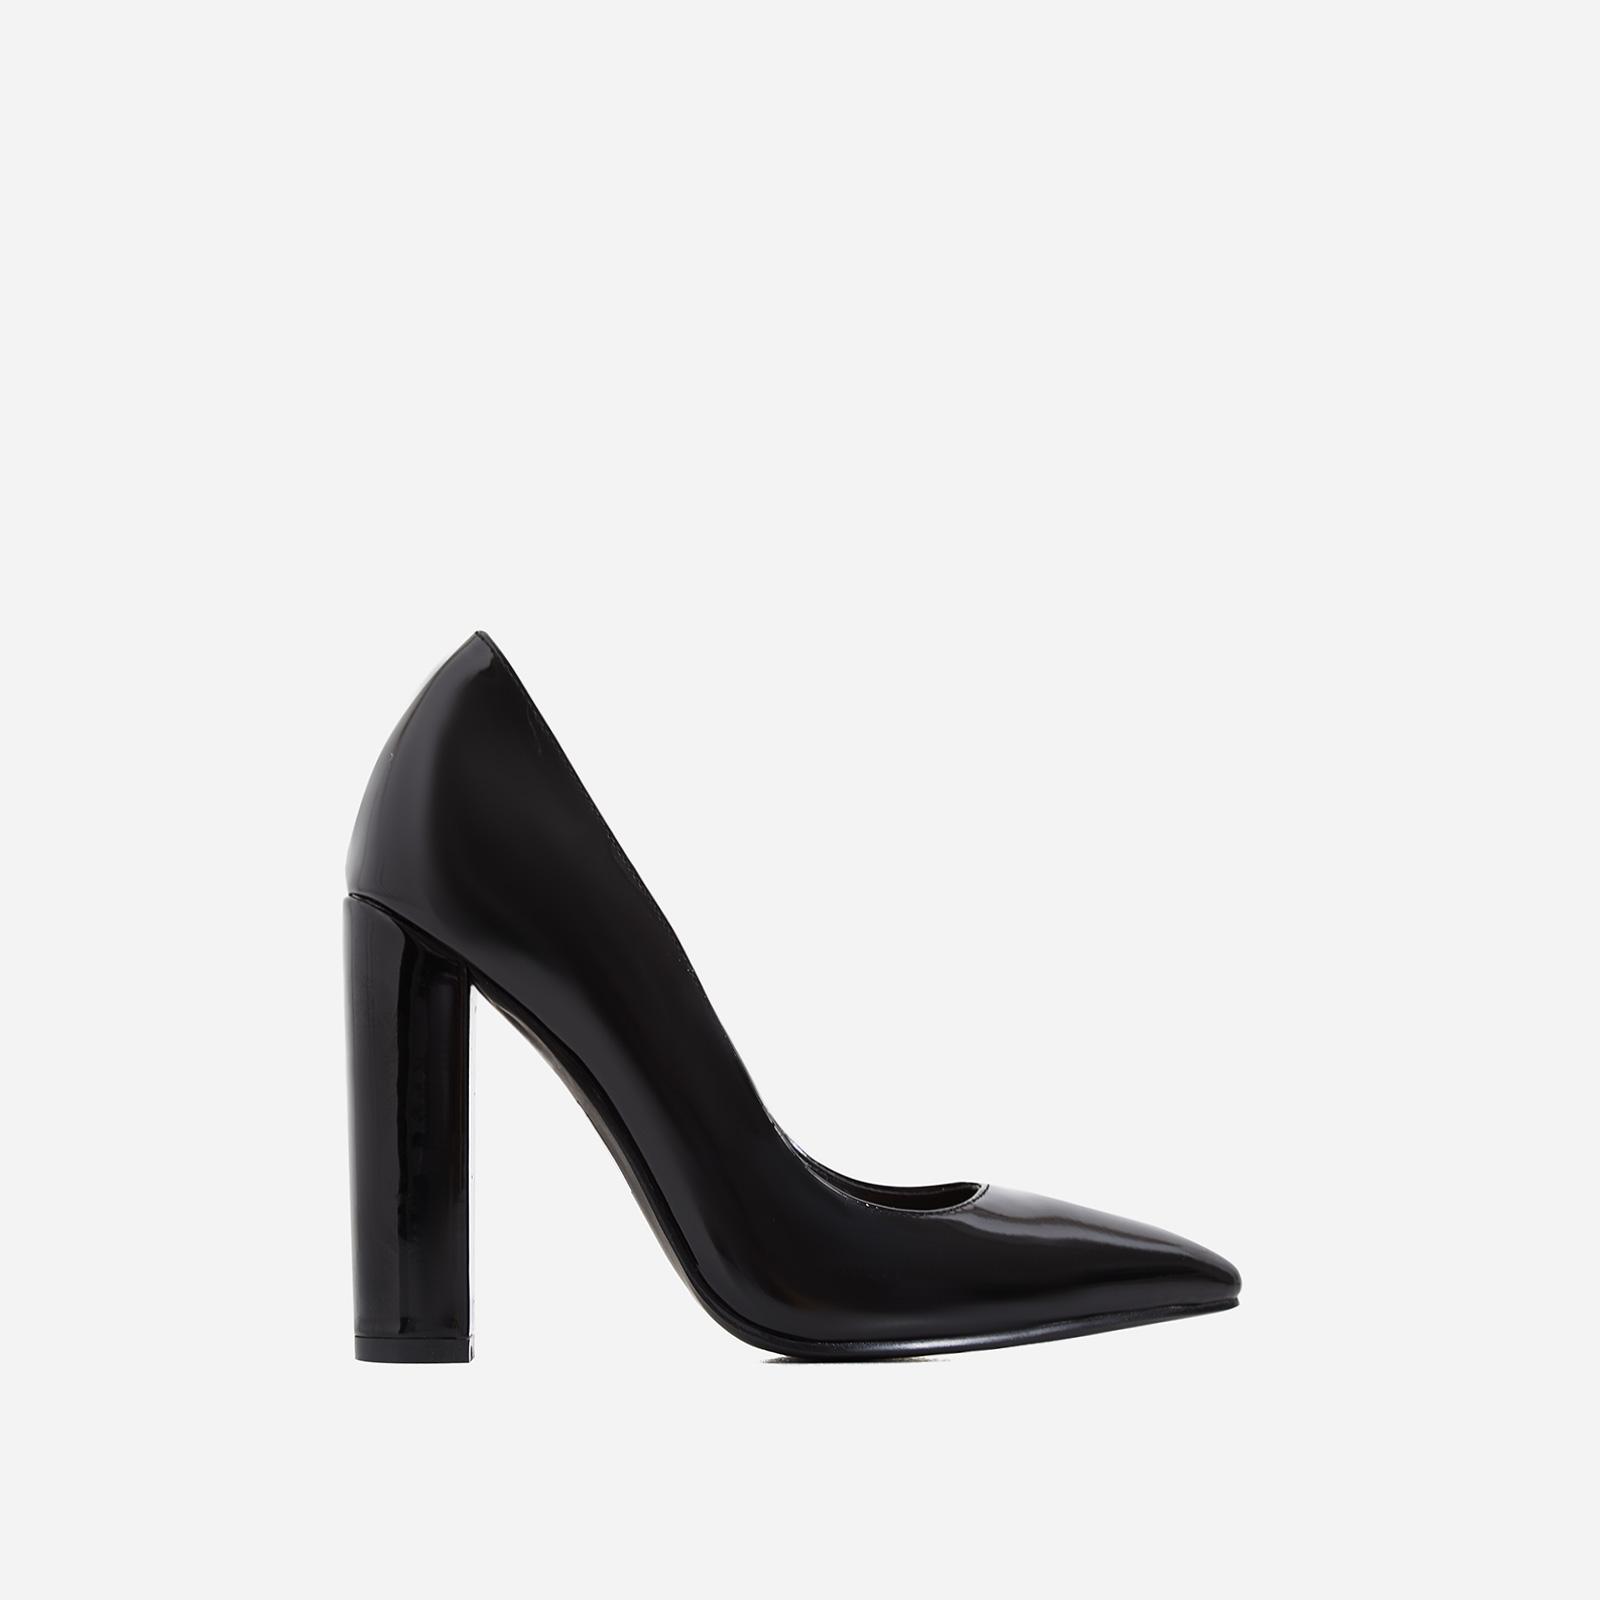 a141b2e207bf Bobbi Block Court Heel In Black Patent